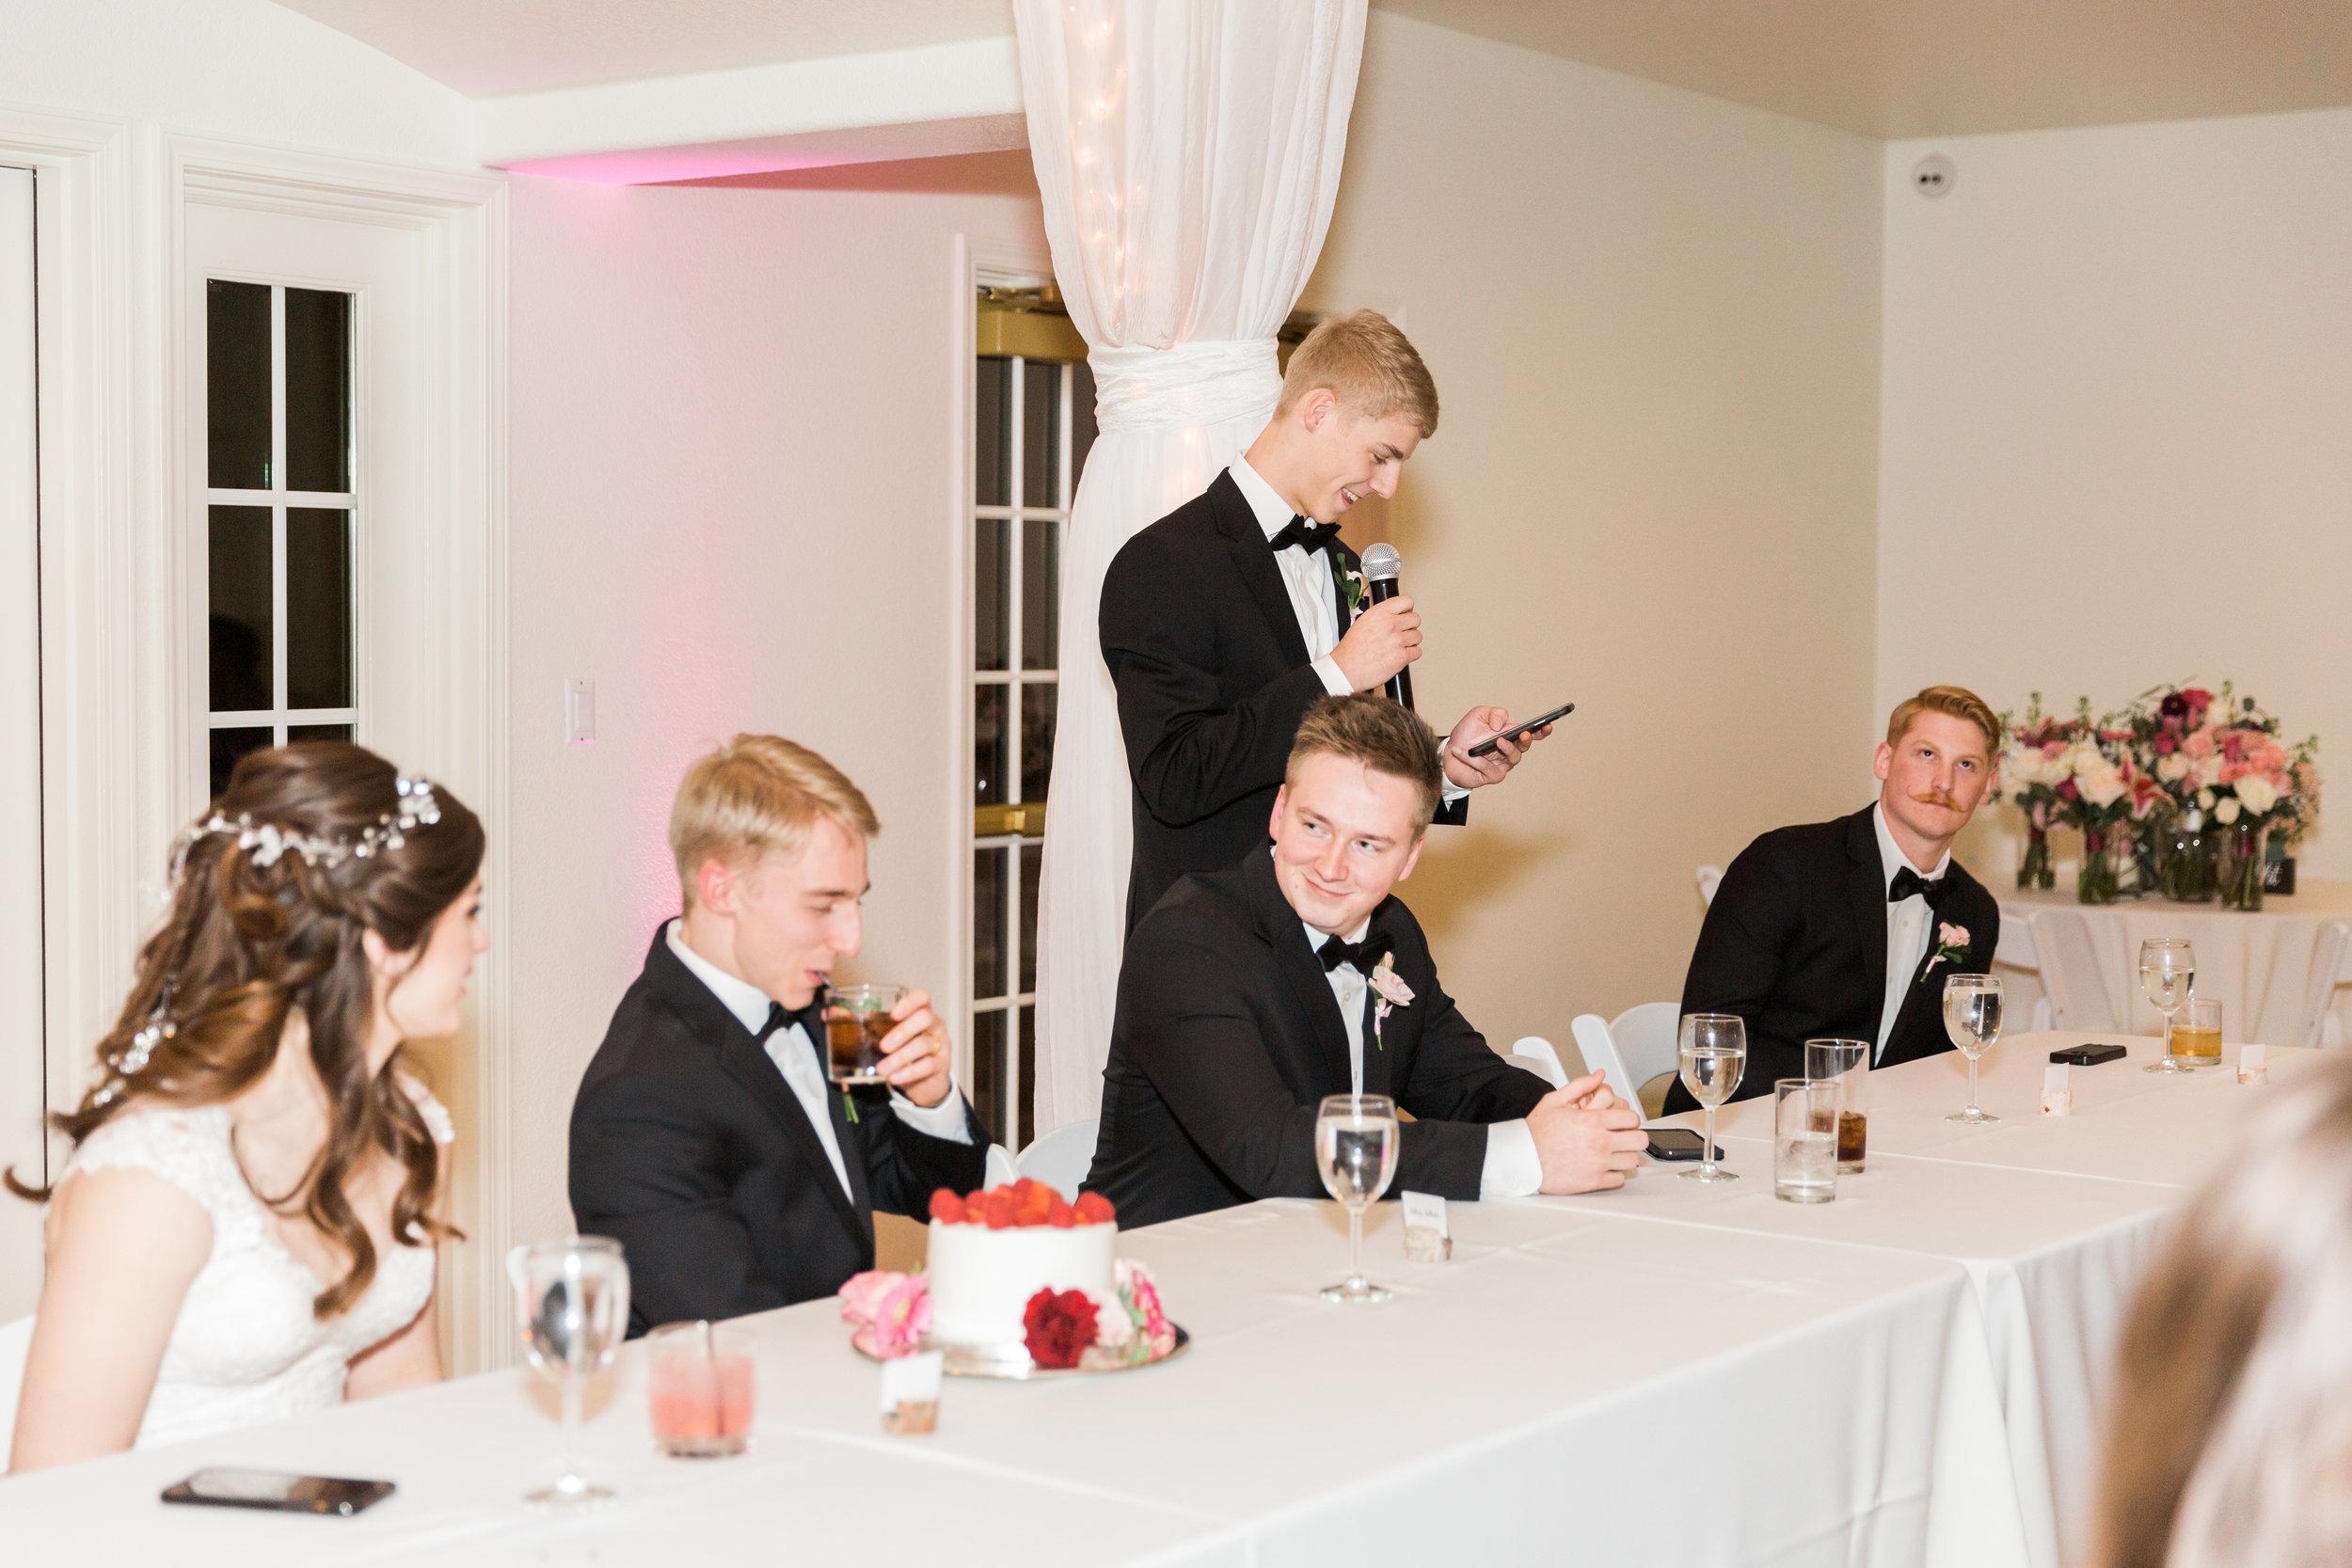 romanticcoloradodestinationwedding-50.jpg